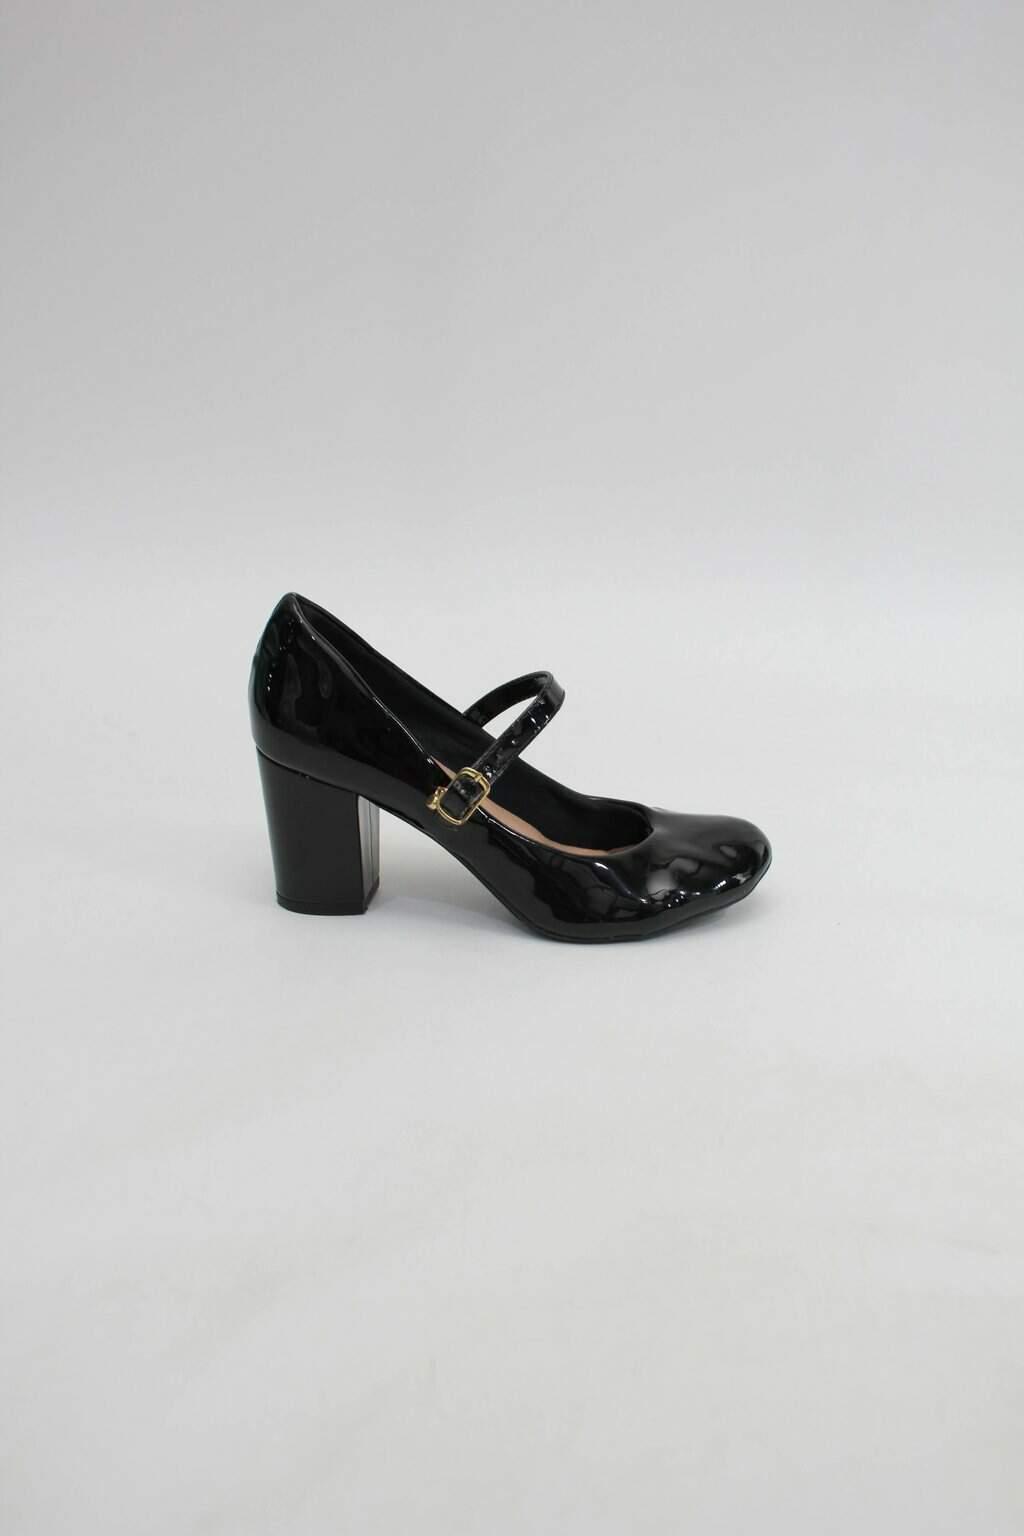 Sapato villarosa feminino preto